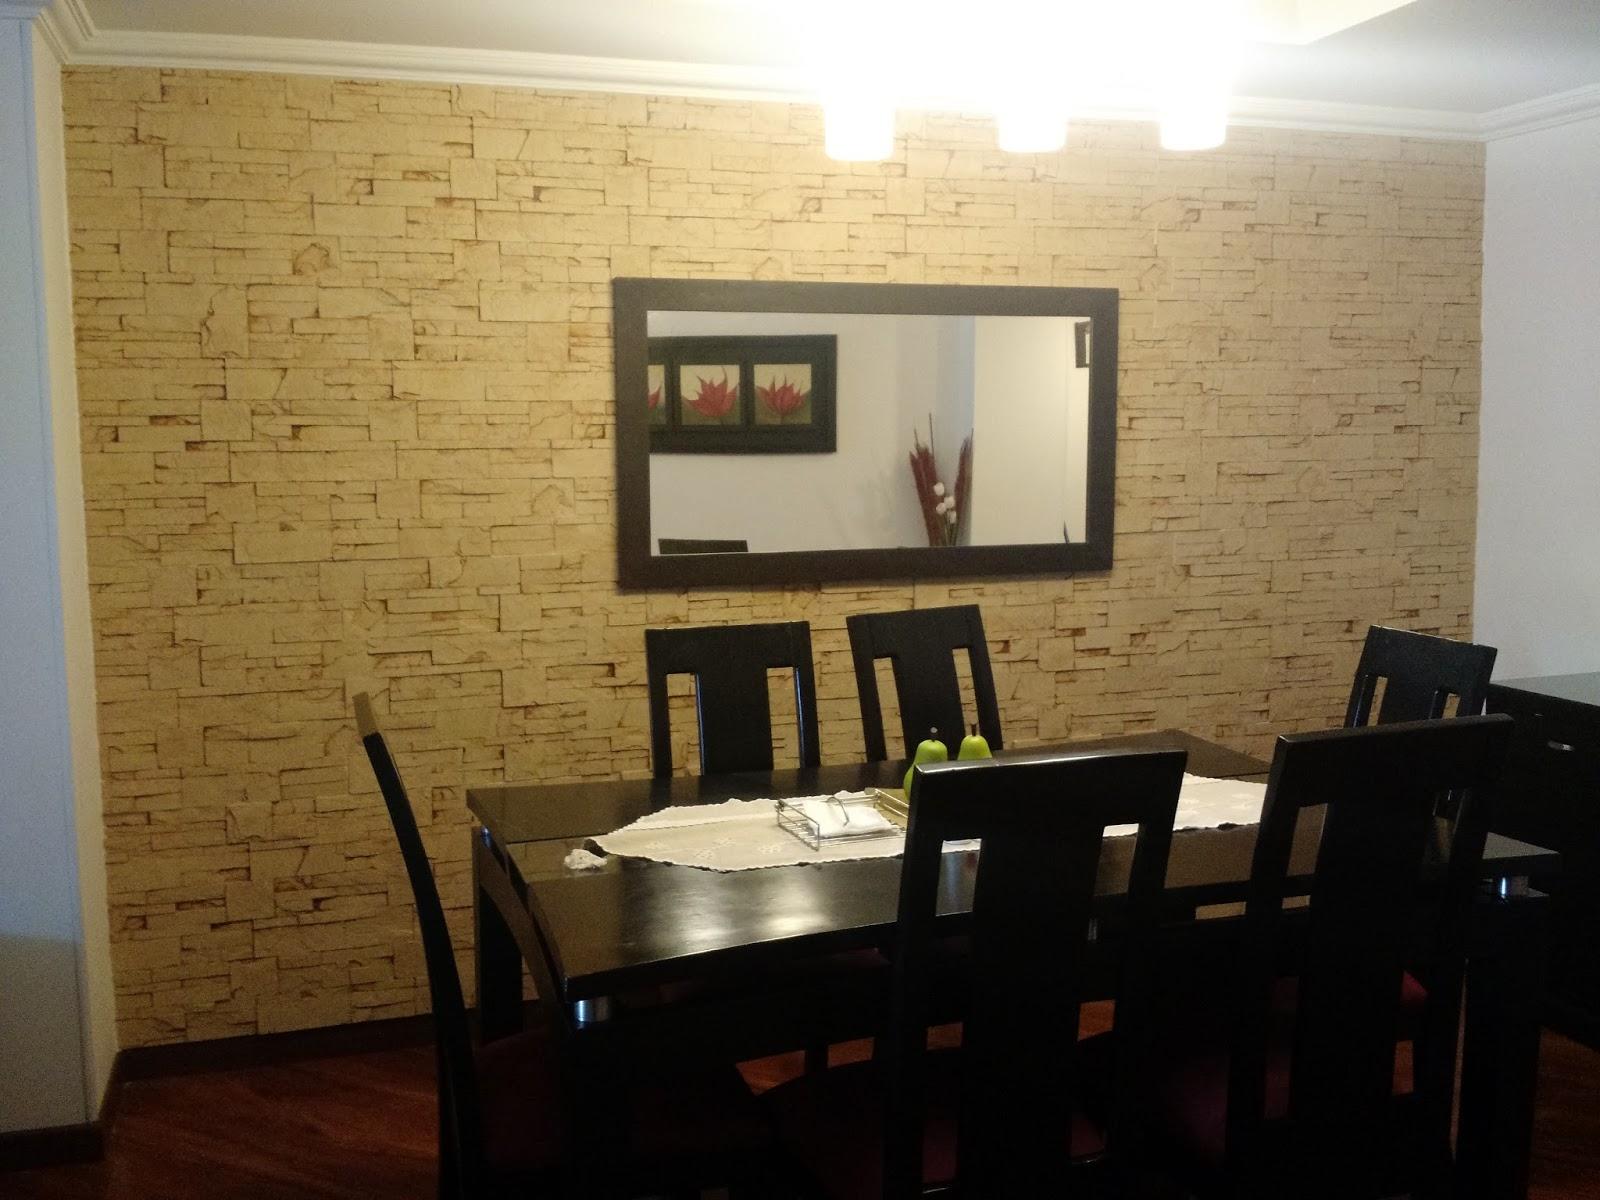 Panel decorativo poling laja dagua marfil pared interior - Pared interior de piedra ...